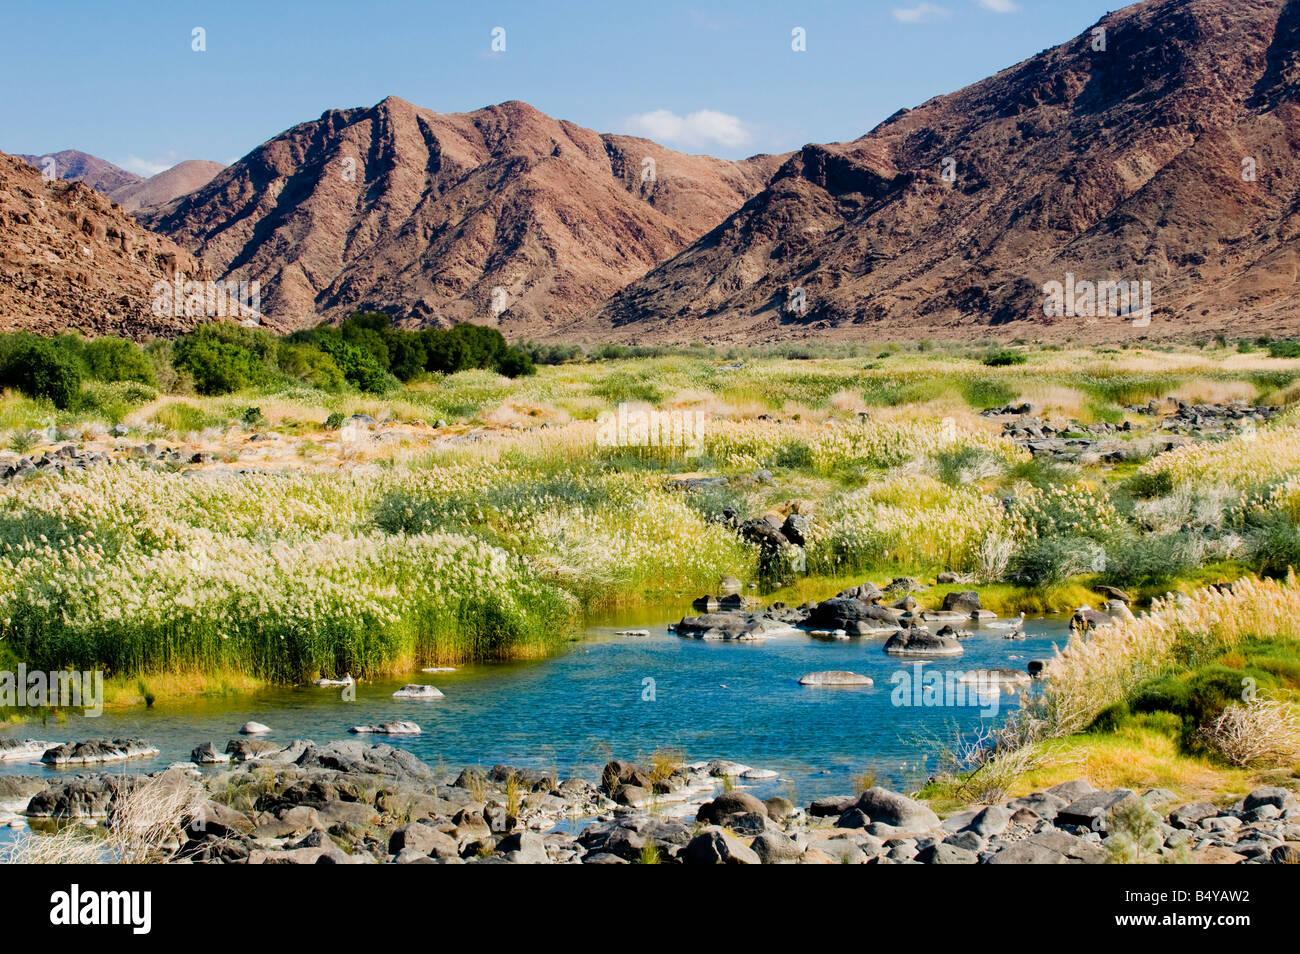 Oranje River, landscape, Richtersveld National Park, Northern Cape, South Africa - Stock Image